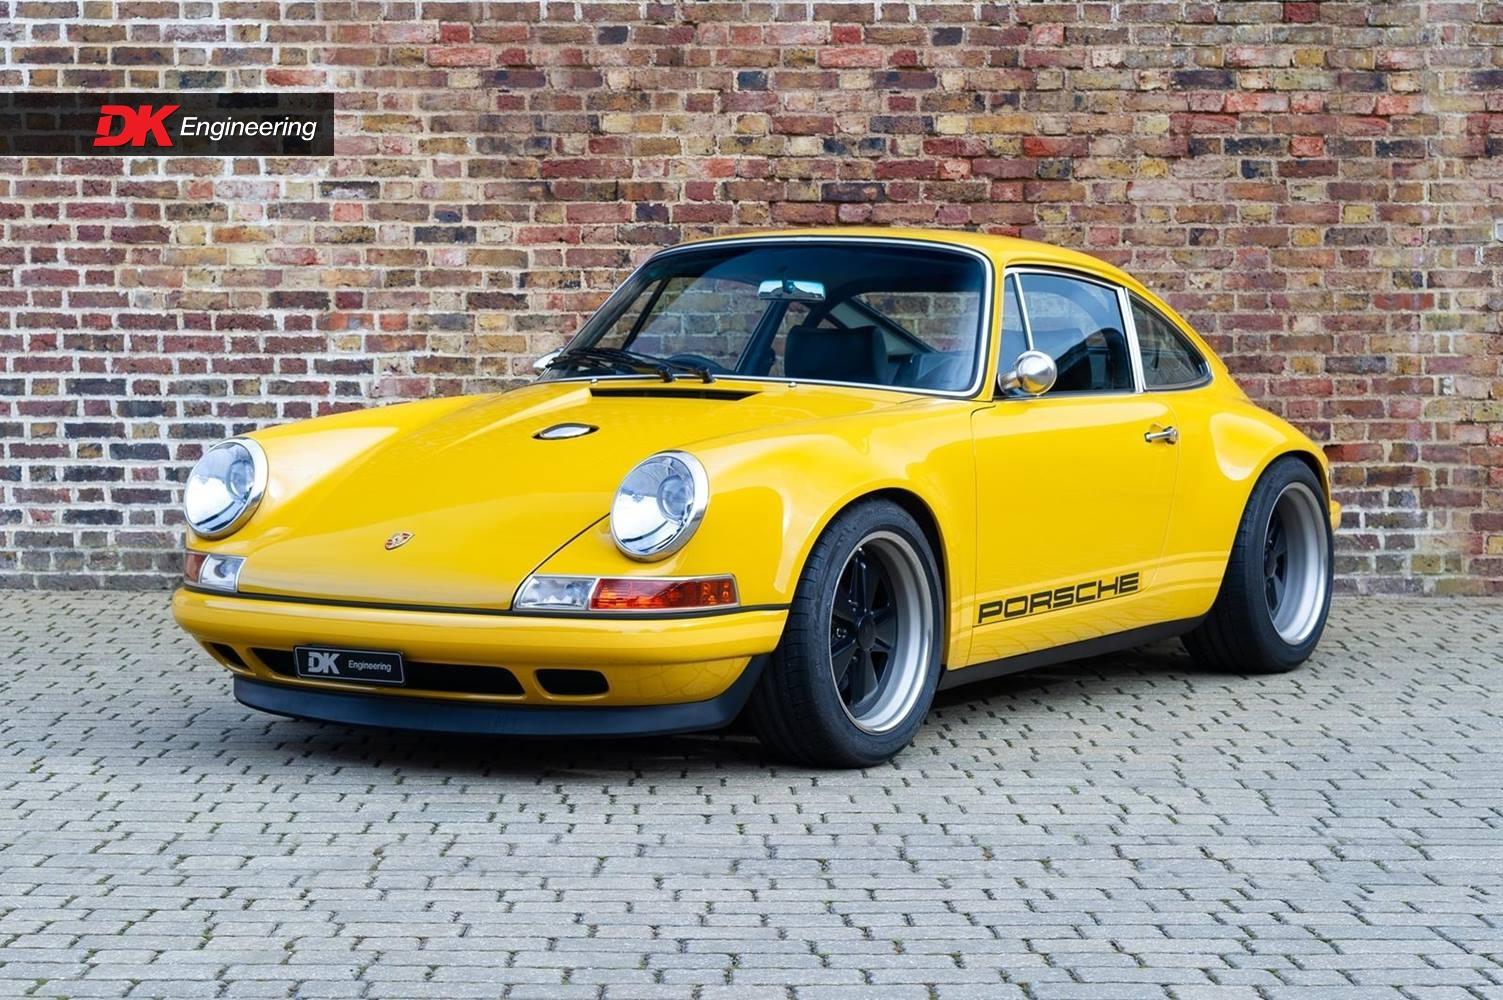 Porsche 911 Singer For Sale Vehicle Sales Dk Engineering